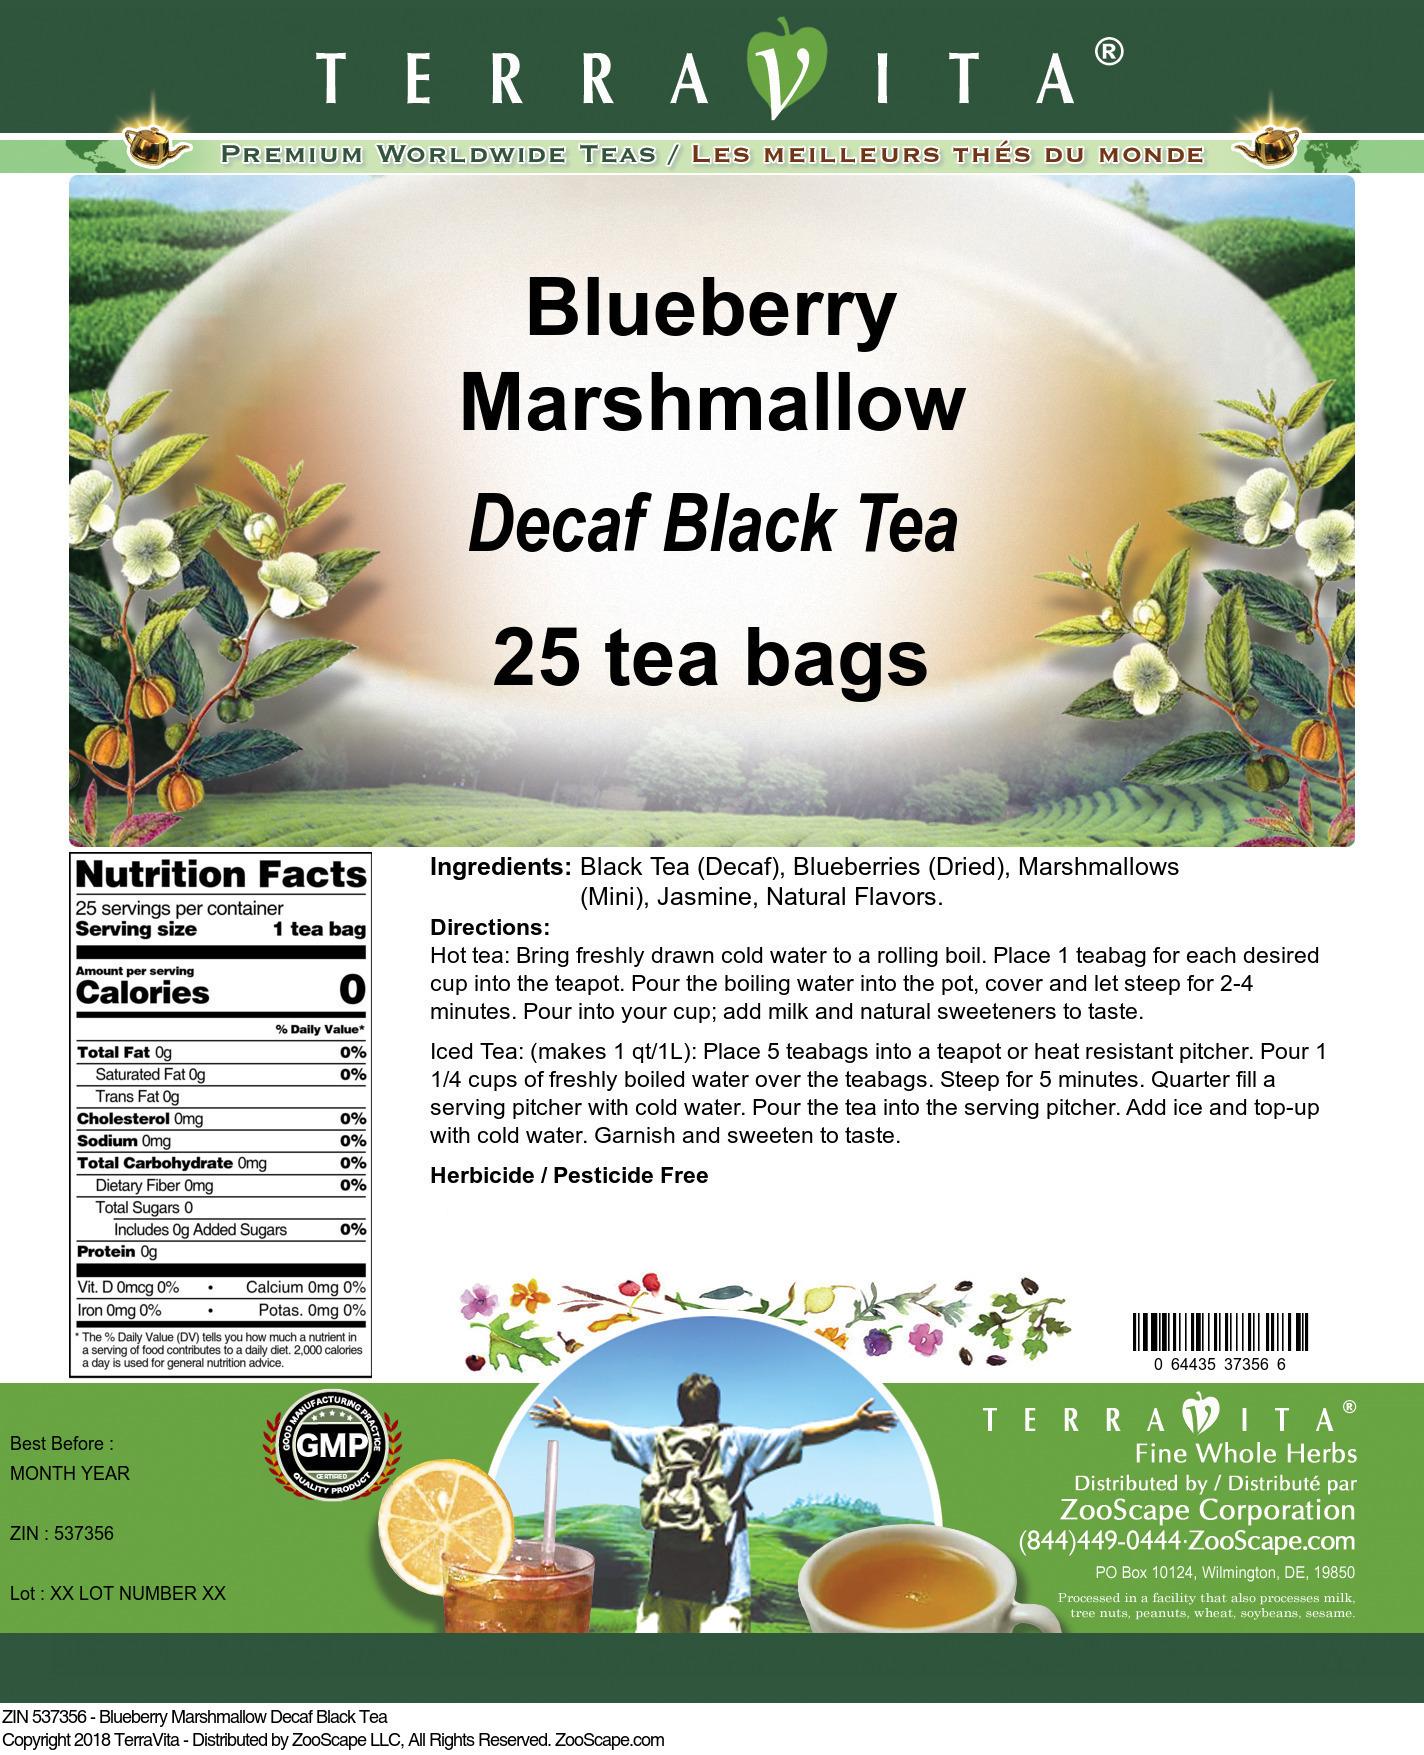 Blueberry Marshmallow Decaf Black Tea